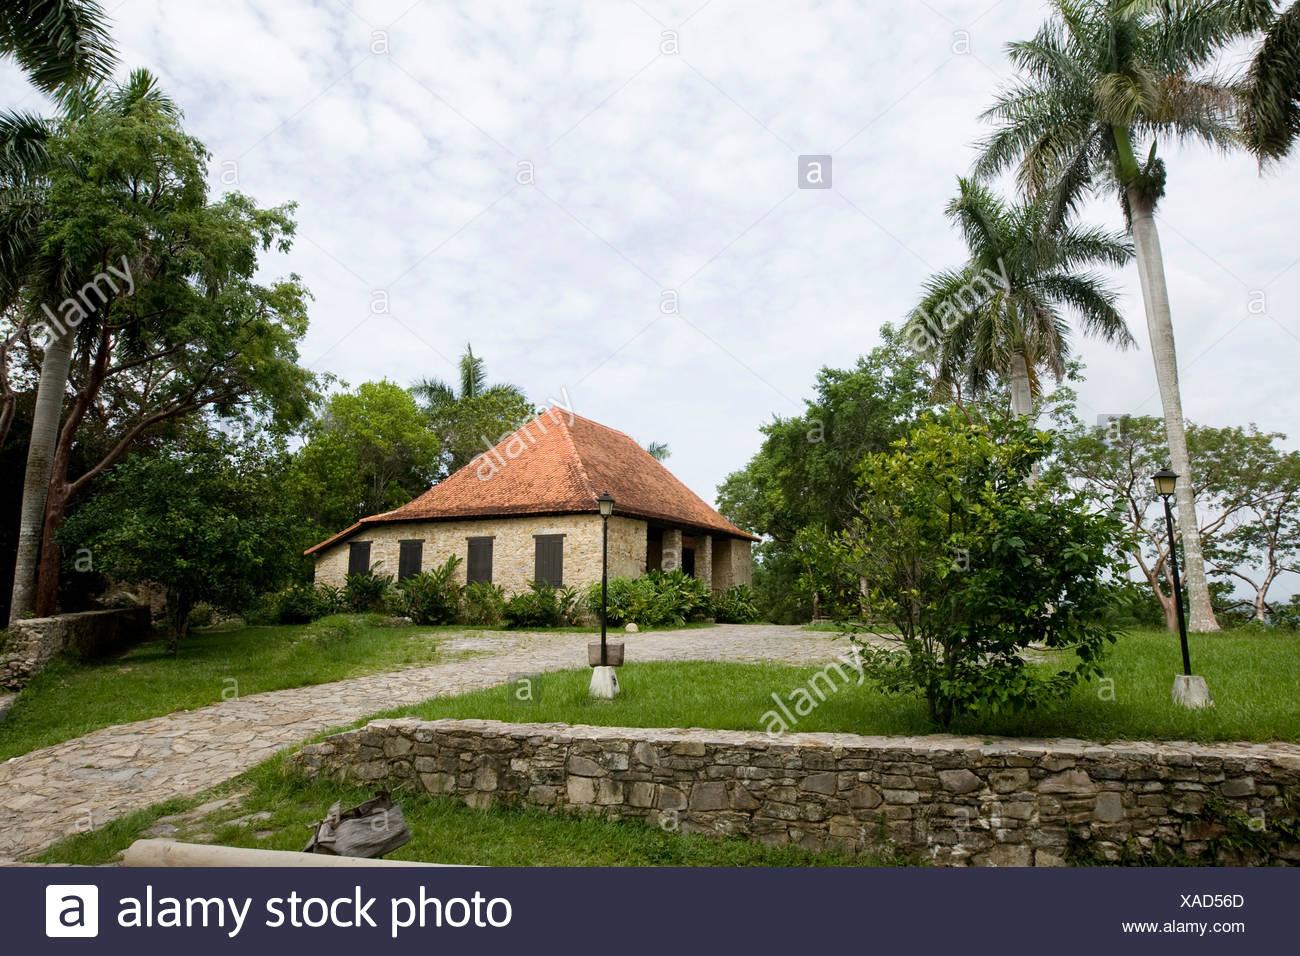 caribbean plantation coloring pages - photo#41